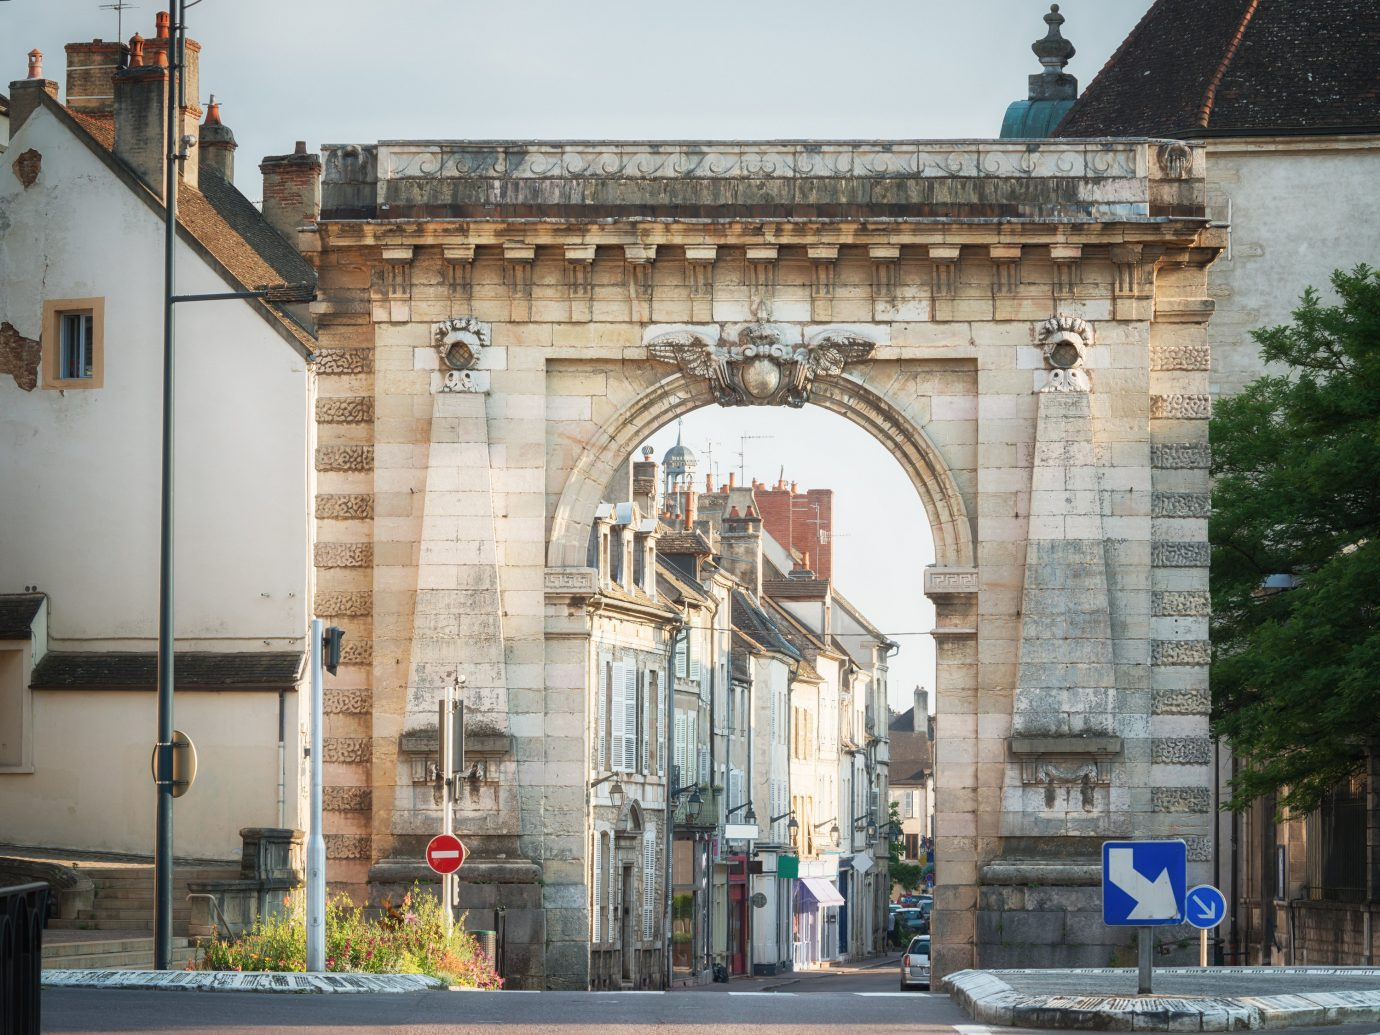 Trip Ideas building landmark arch Architecture facade classical architecture City window